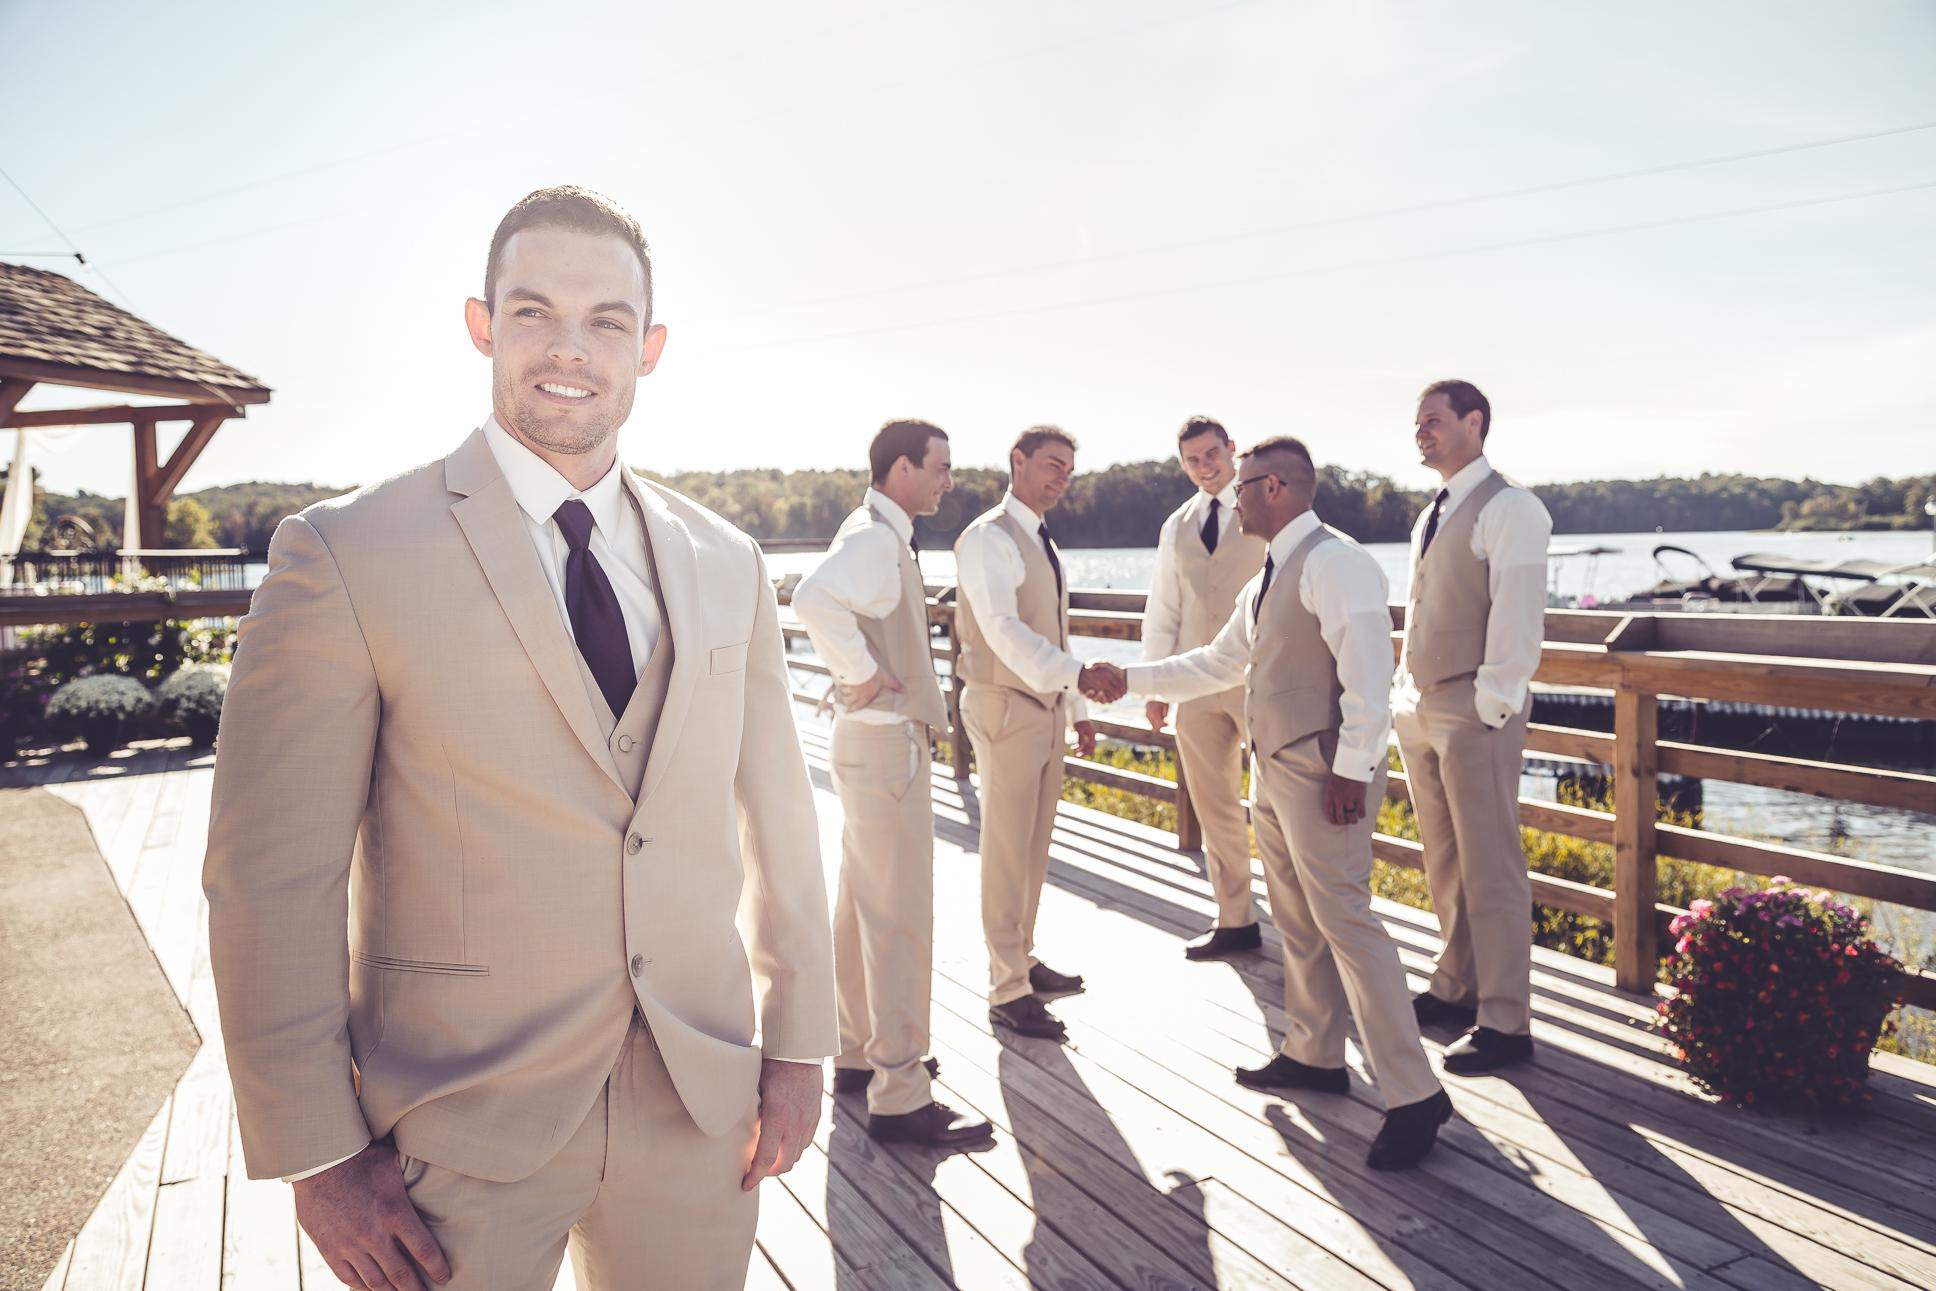 Southern Illinois Wedding Photography - Dustin Morrison Photography - Byrne Wedding-7.jpg